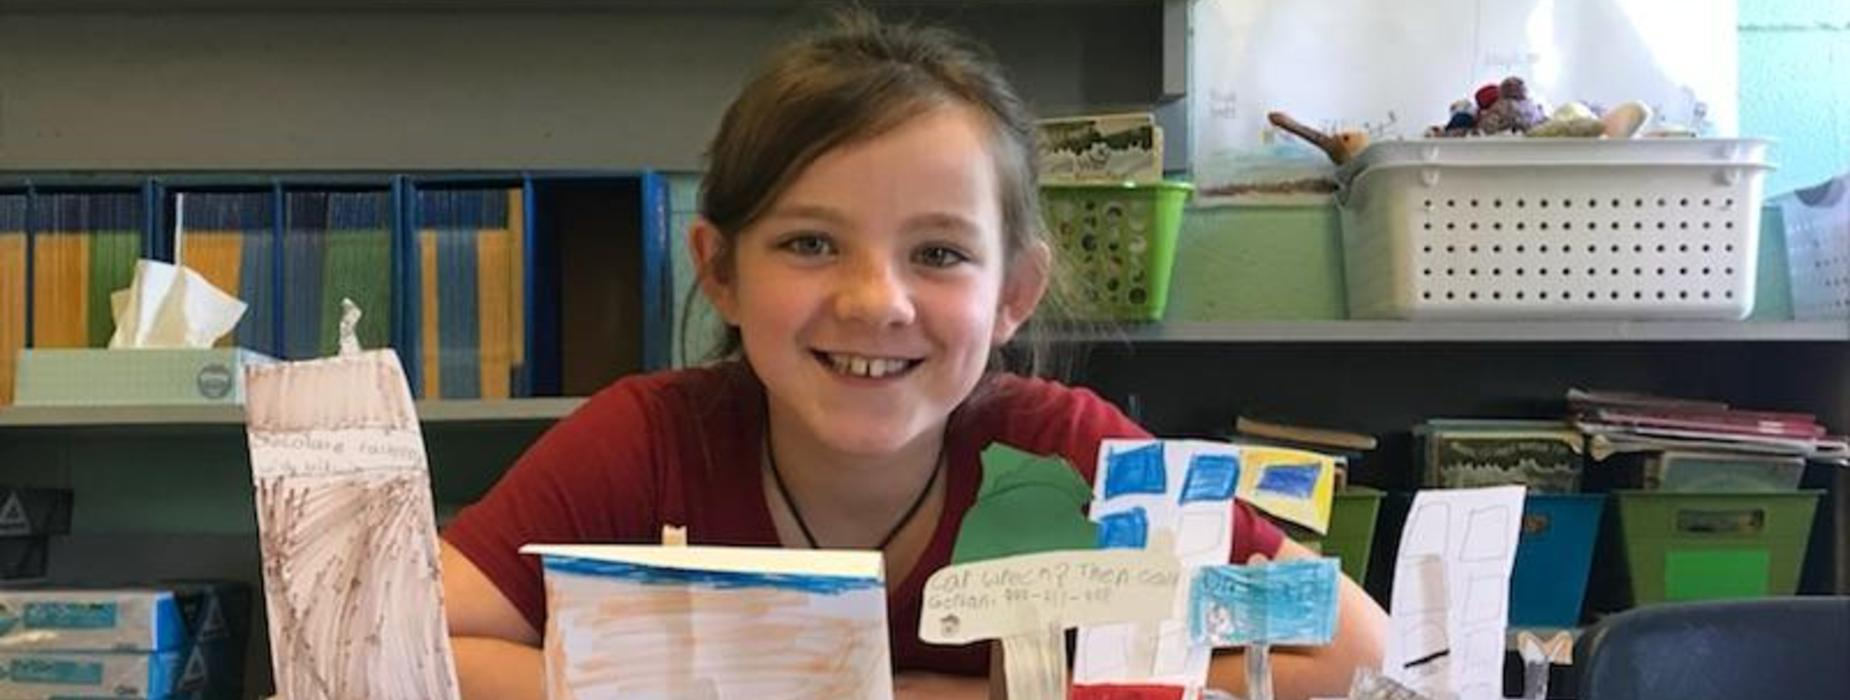 3rd grade project